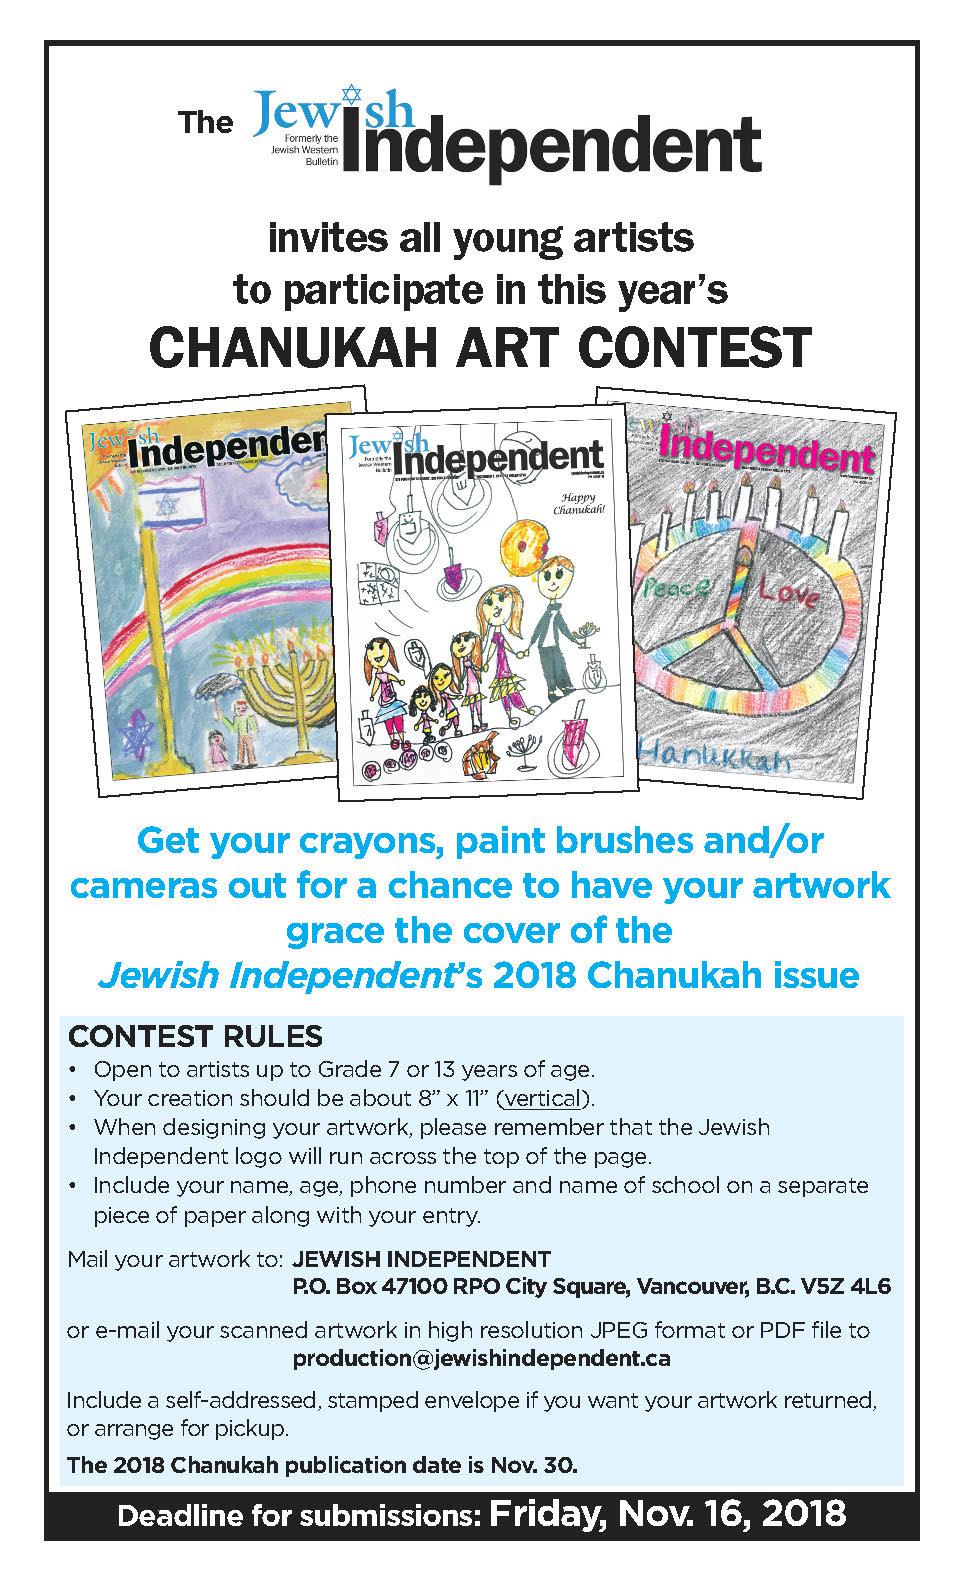 image - 2018 Chanukah Art Contest poster